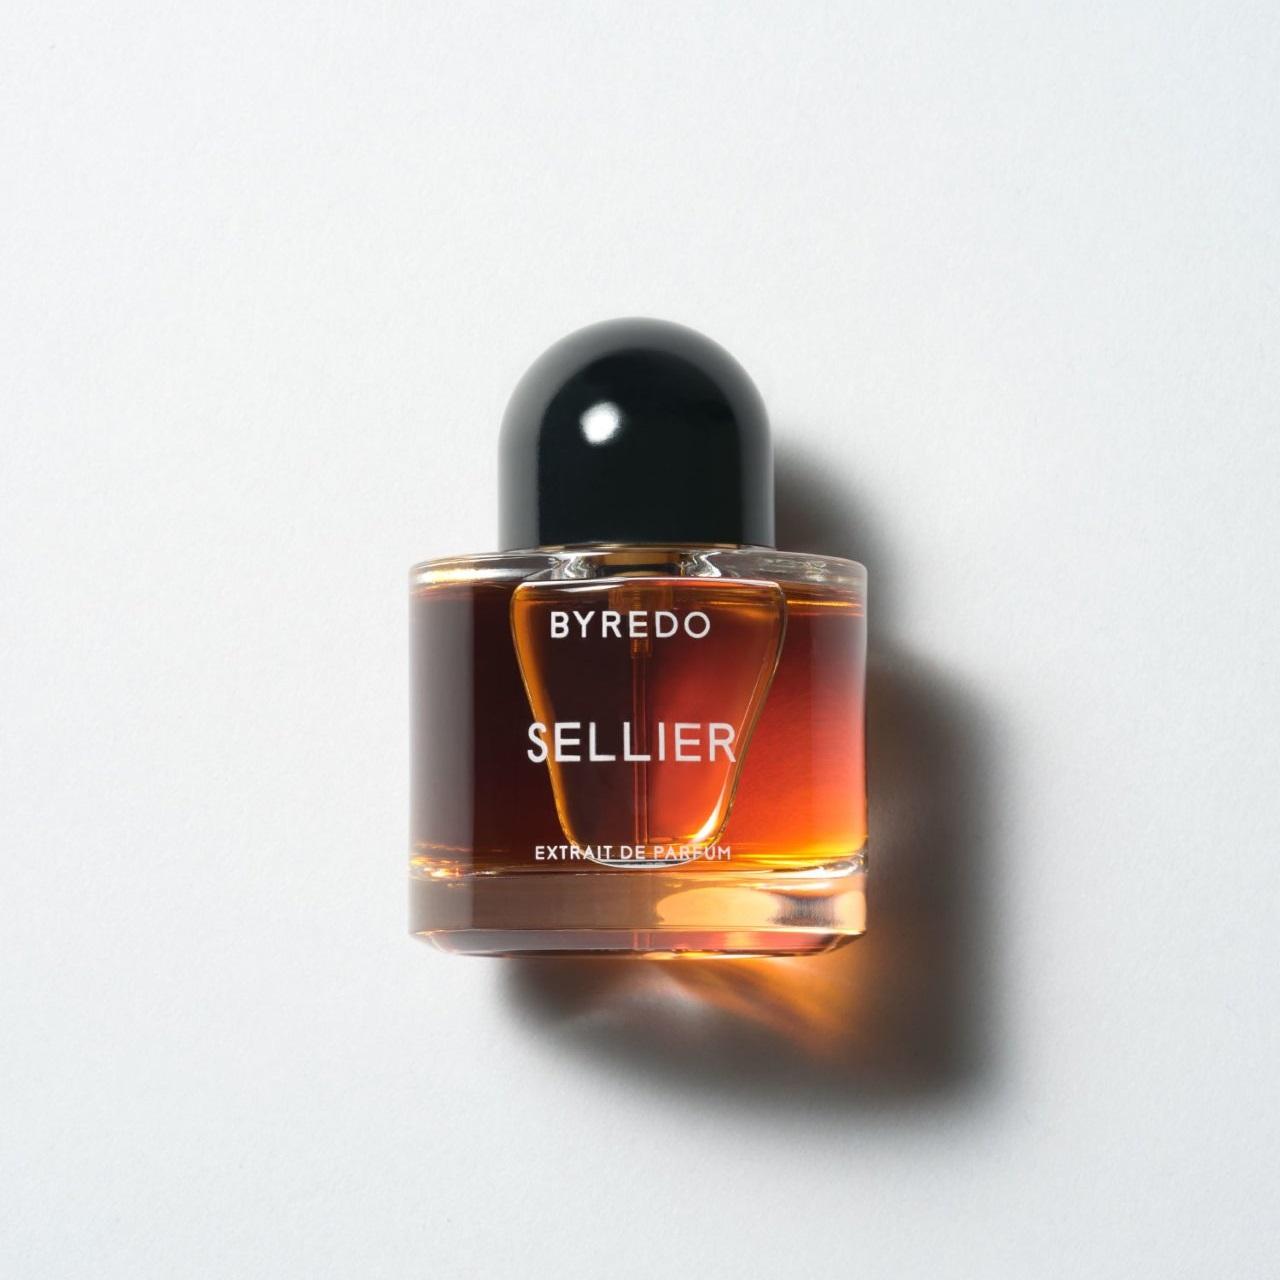 Sellier Byredo